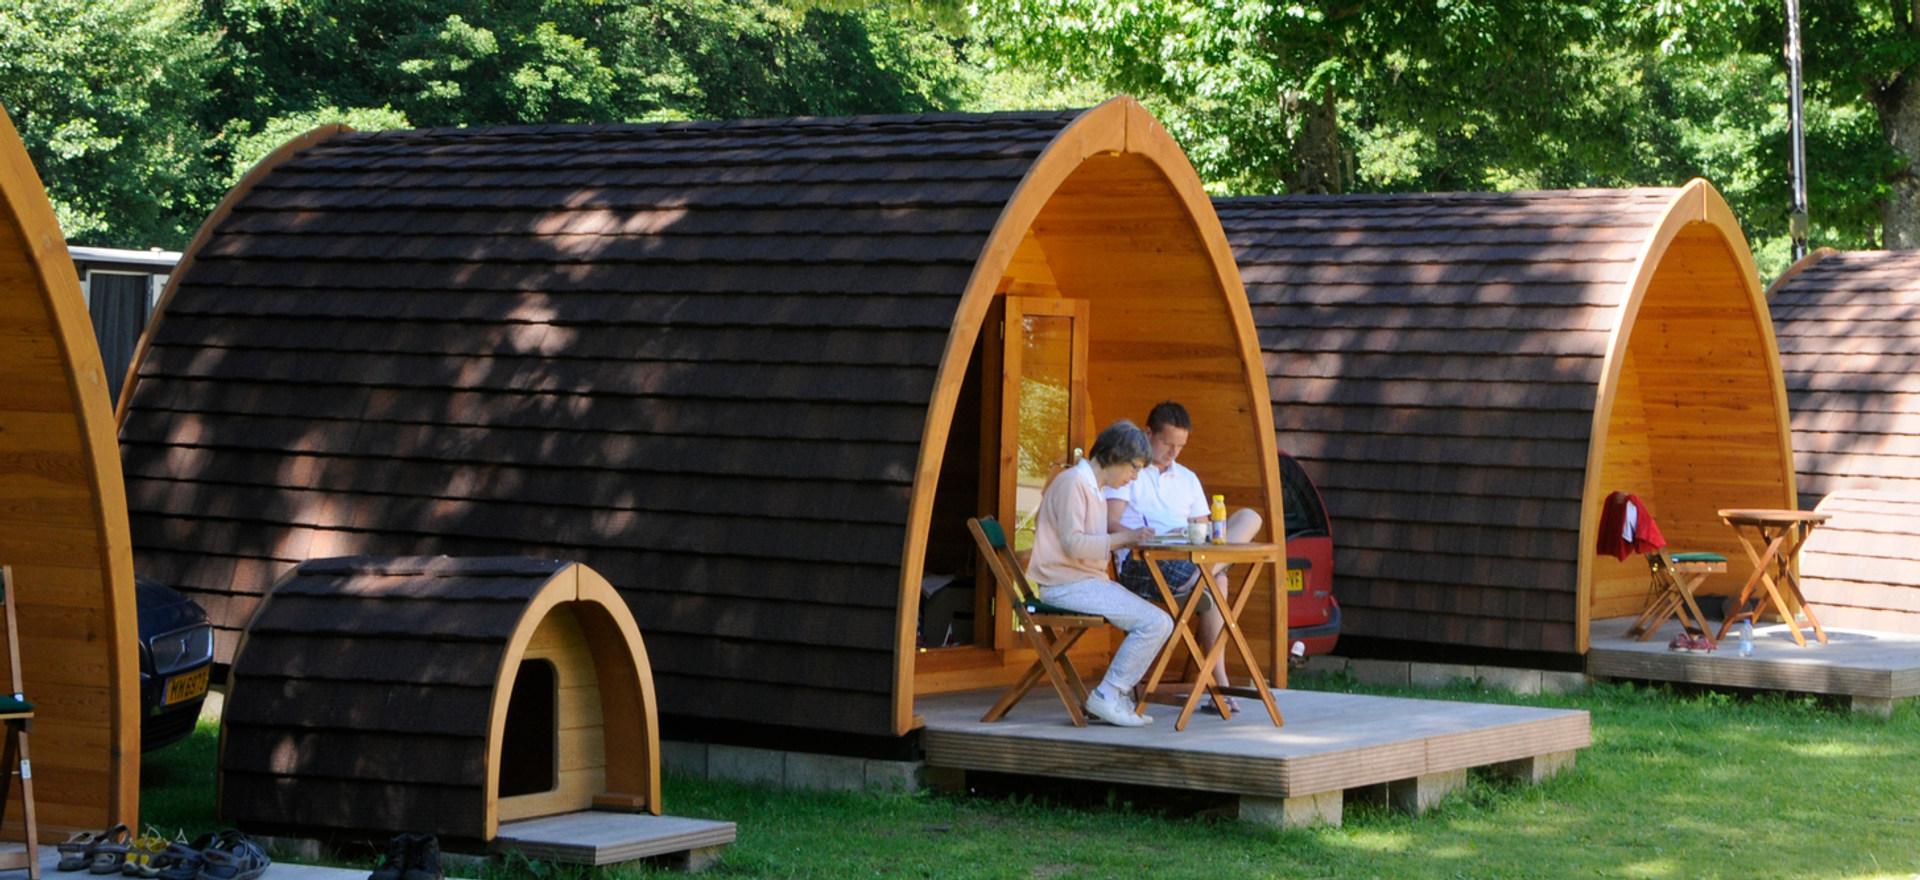 Camping Kautenbach Luxembourg0049.jpg